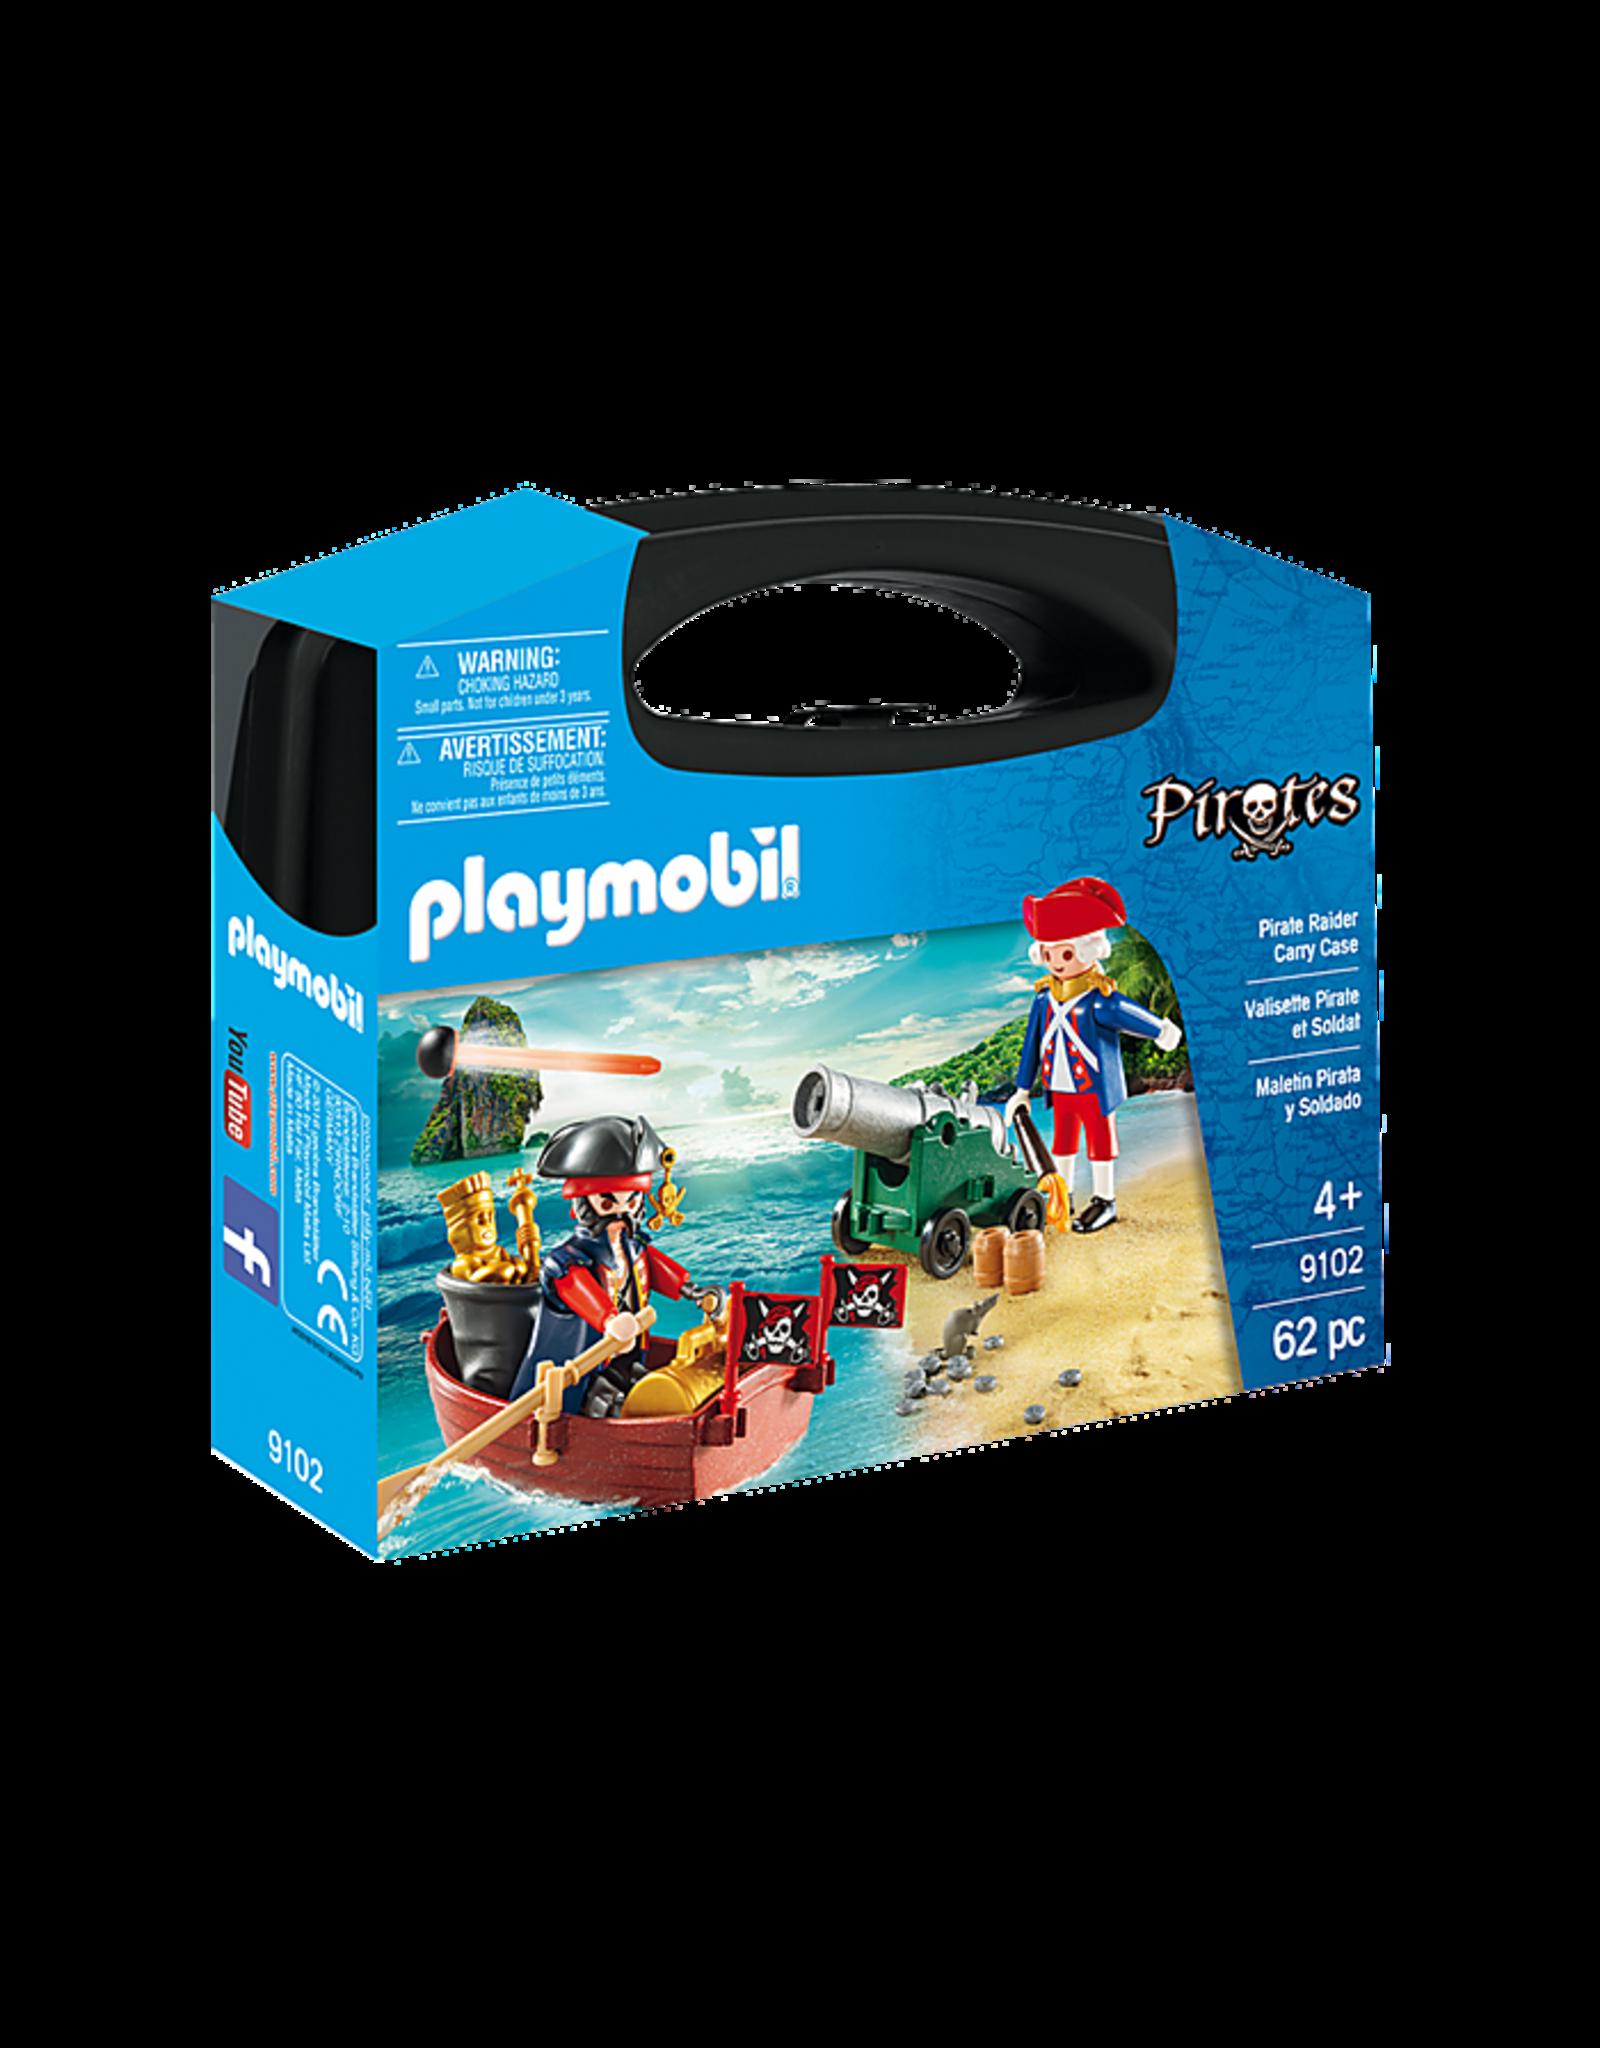 Playmobil Pirate Raider Carry Case Large